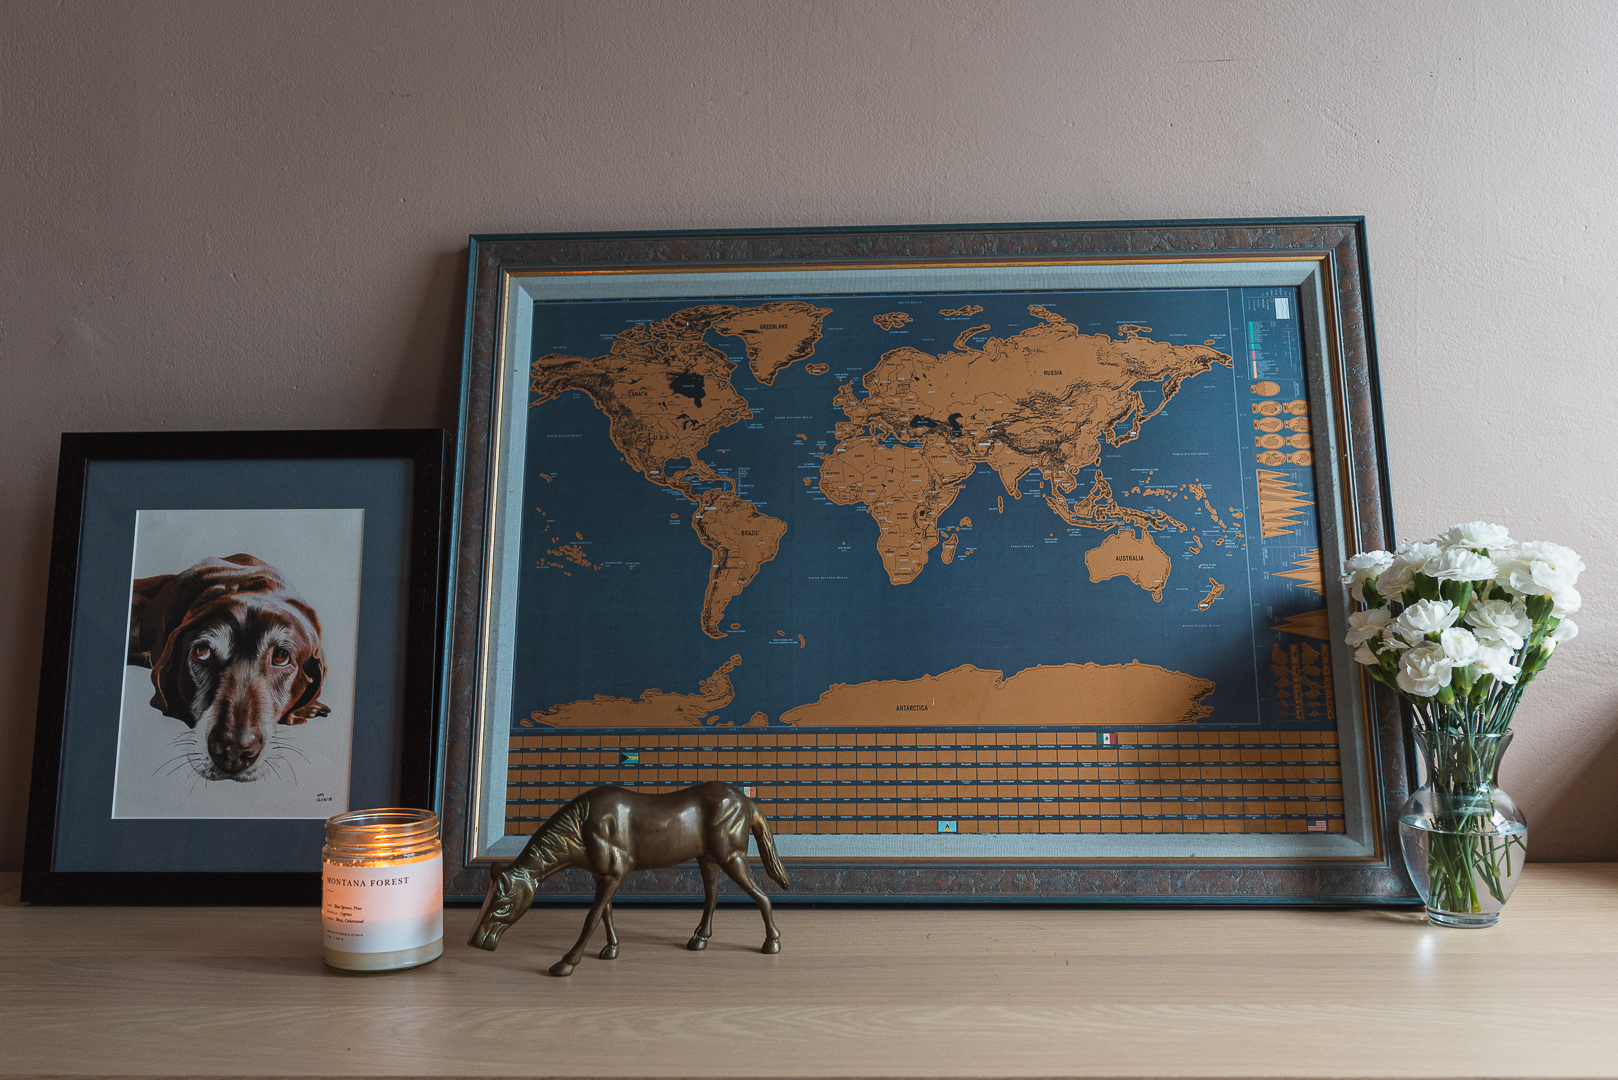 A Serine Sanctuary: Blending Styles in a Contemporary Bedroom, Zen Minimalist design, 70s boho design, neutral palette